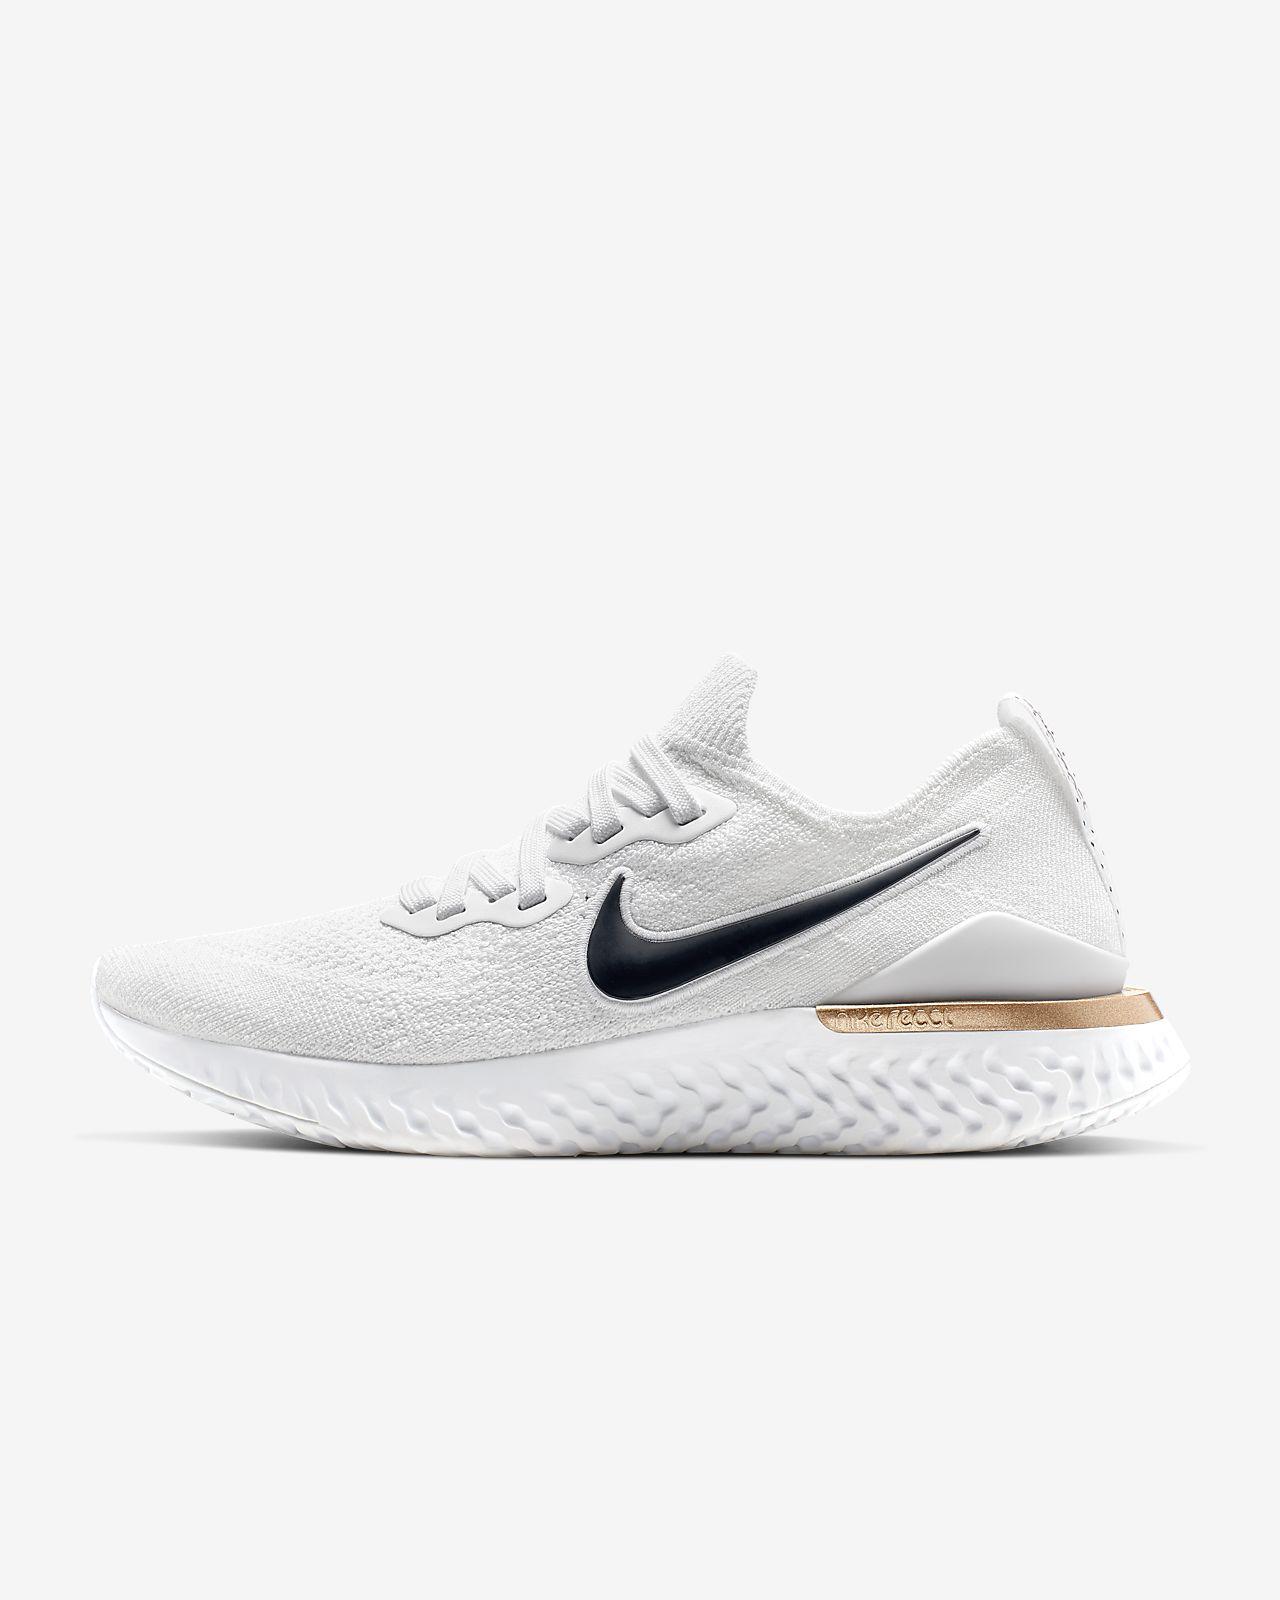 Damskie buty do biegania Nike Epic React Flyknit 2 Unité Totale